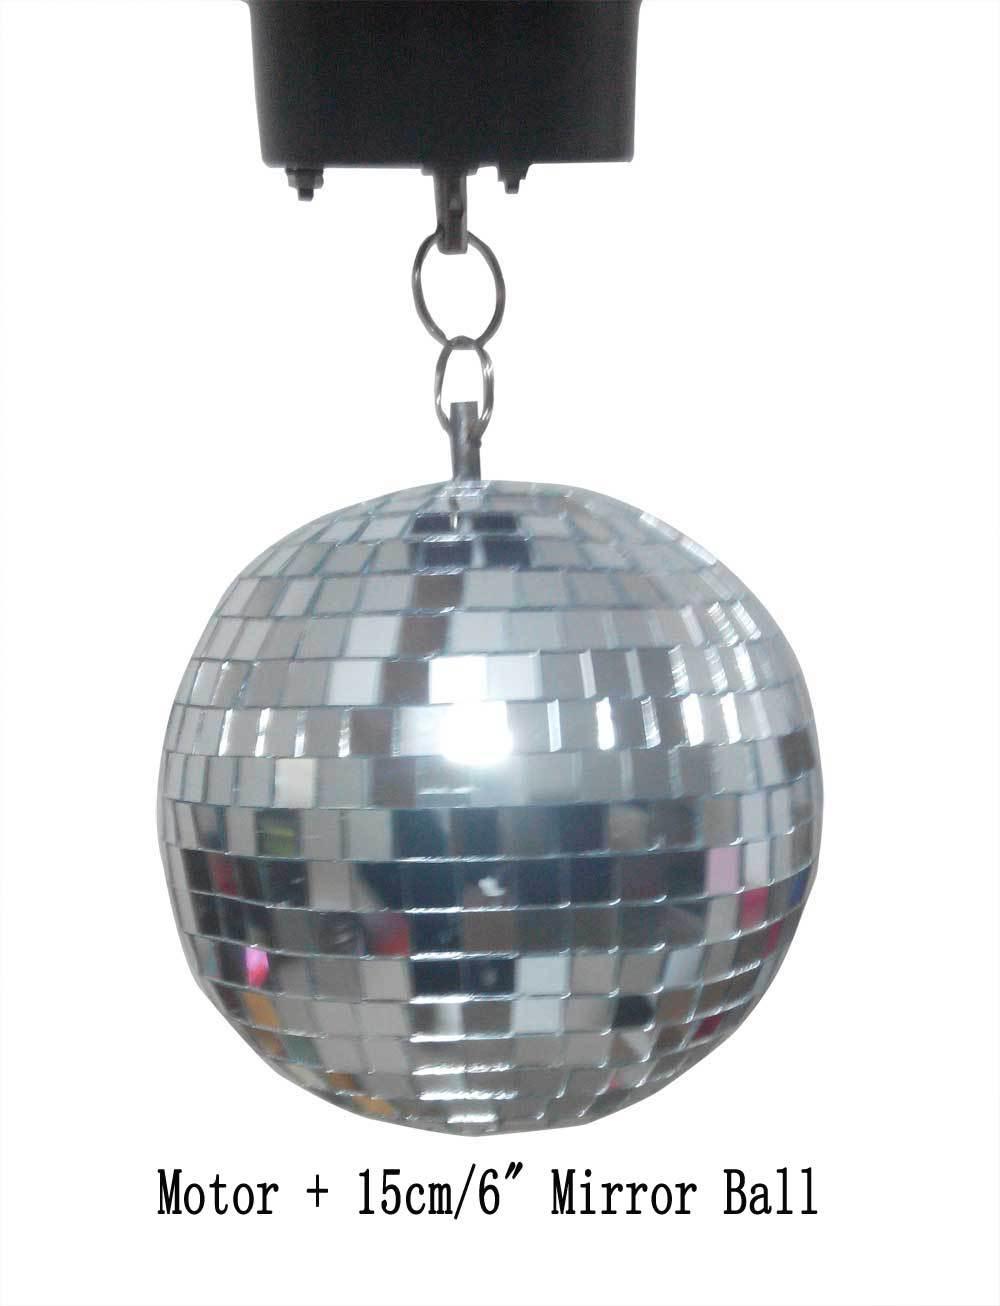 Nº15 cm vidrio transparente giratoria Bola de Espejos 6 Iluminación ...